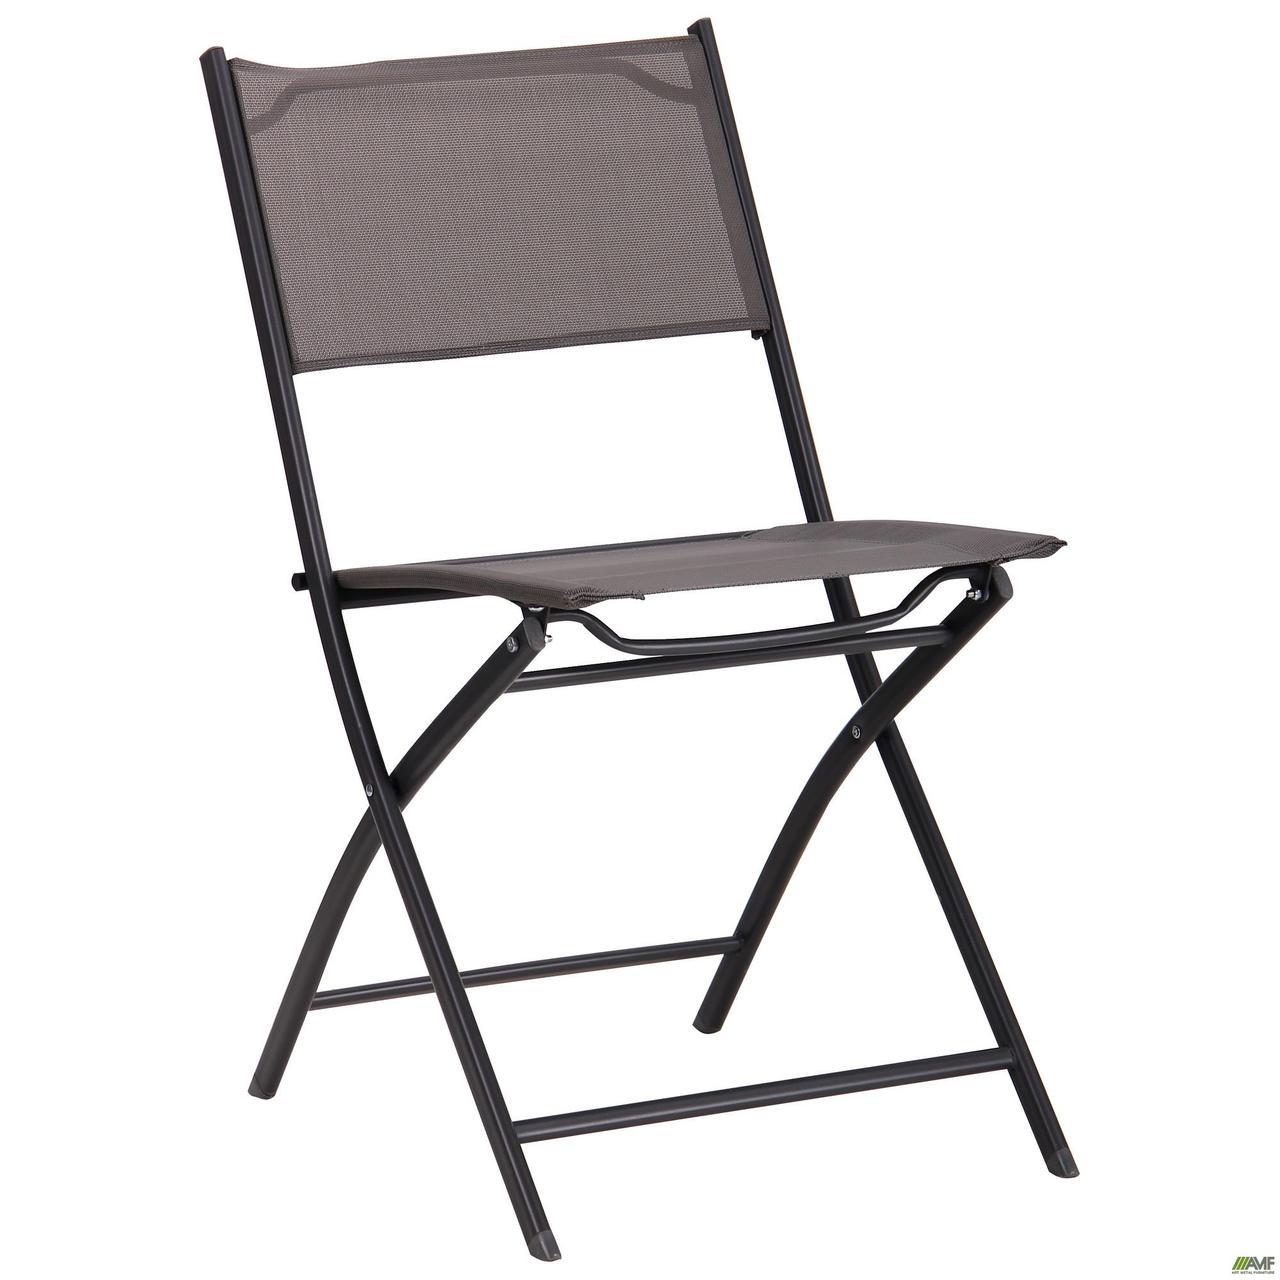 AMF / Складной металлический стул АМФ Linda т.серый серый